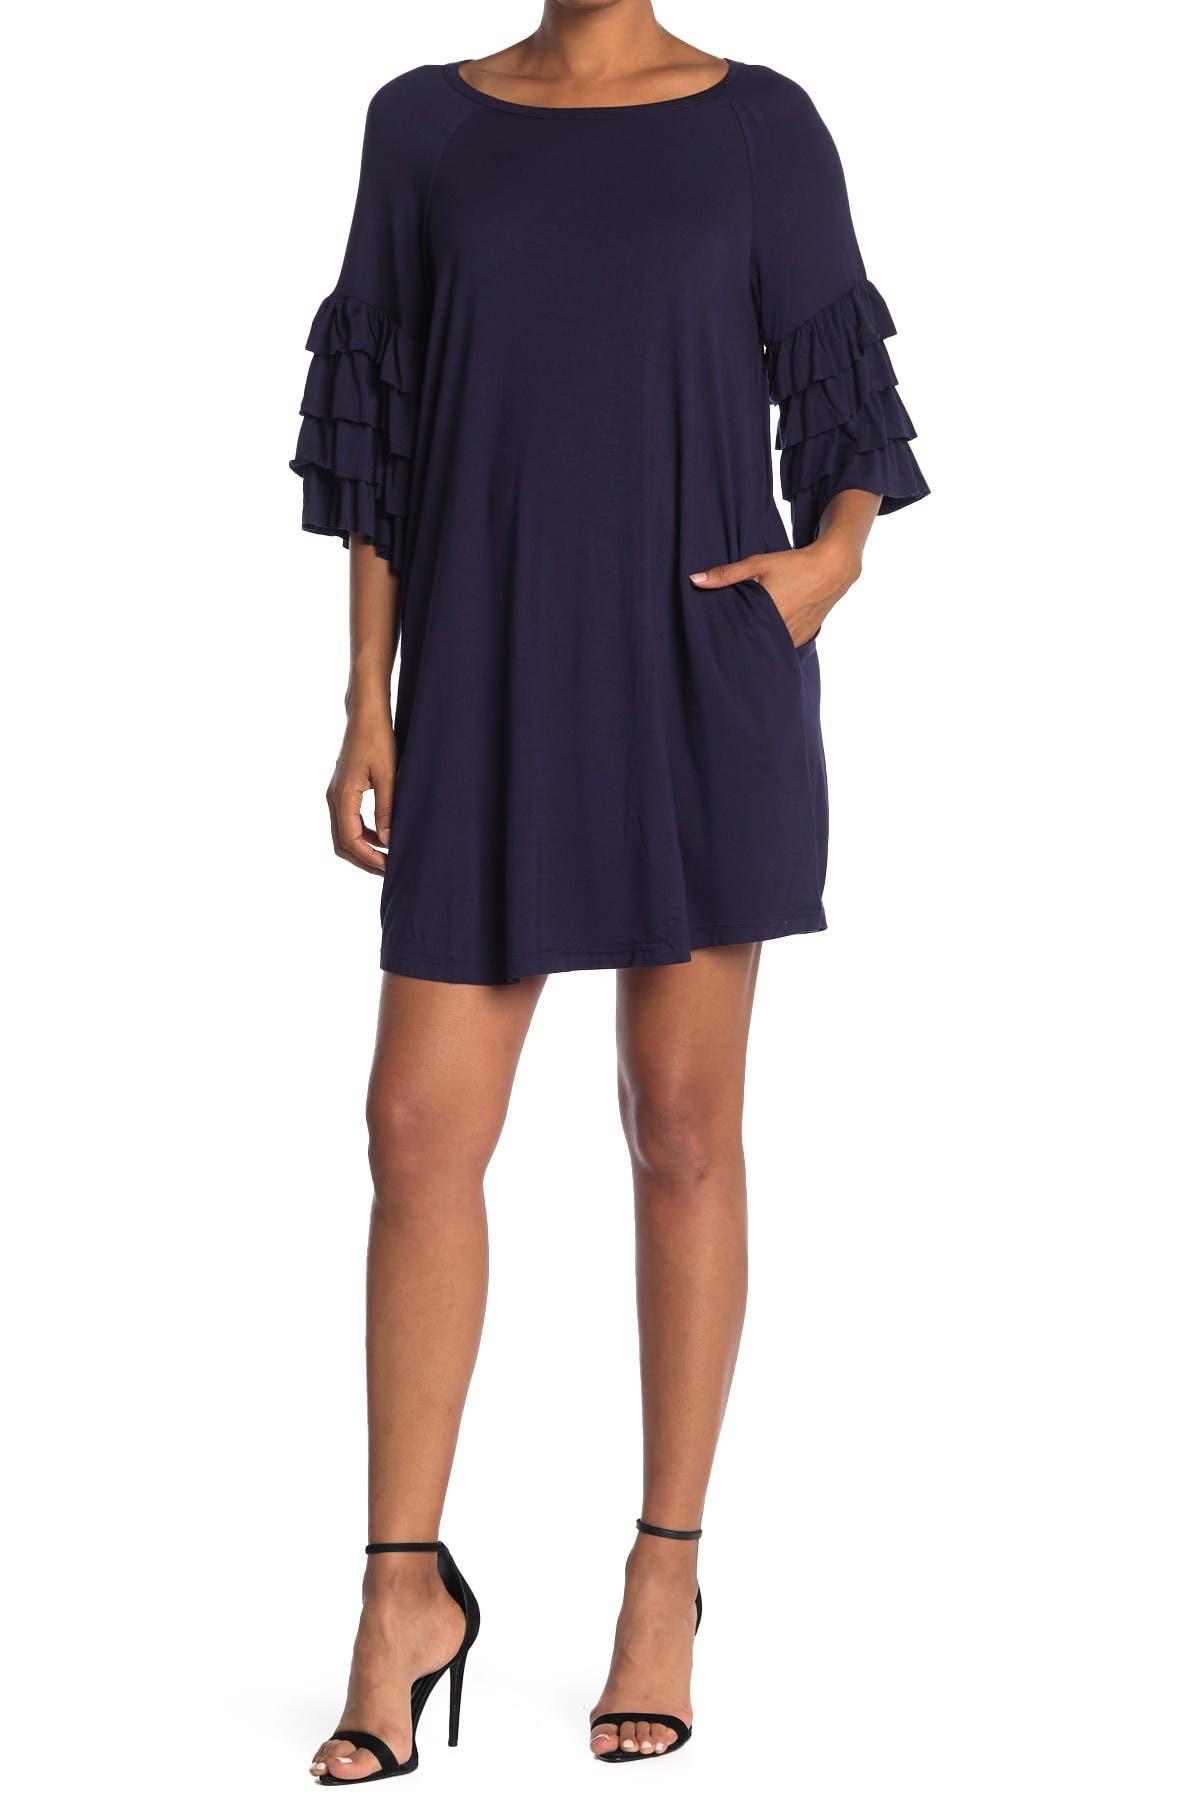 Image of HYFVE Tiered Sleeve Mini Dress